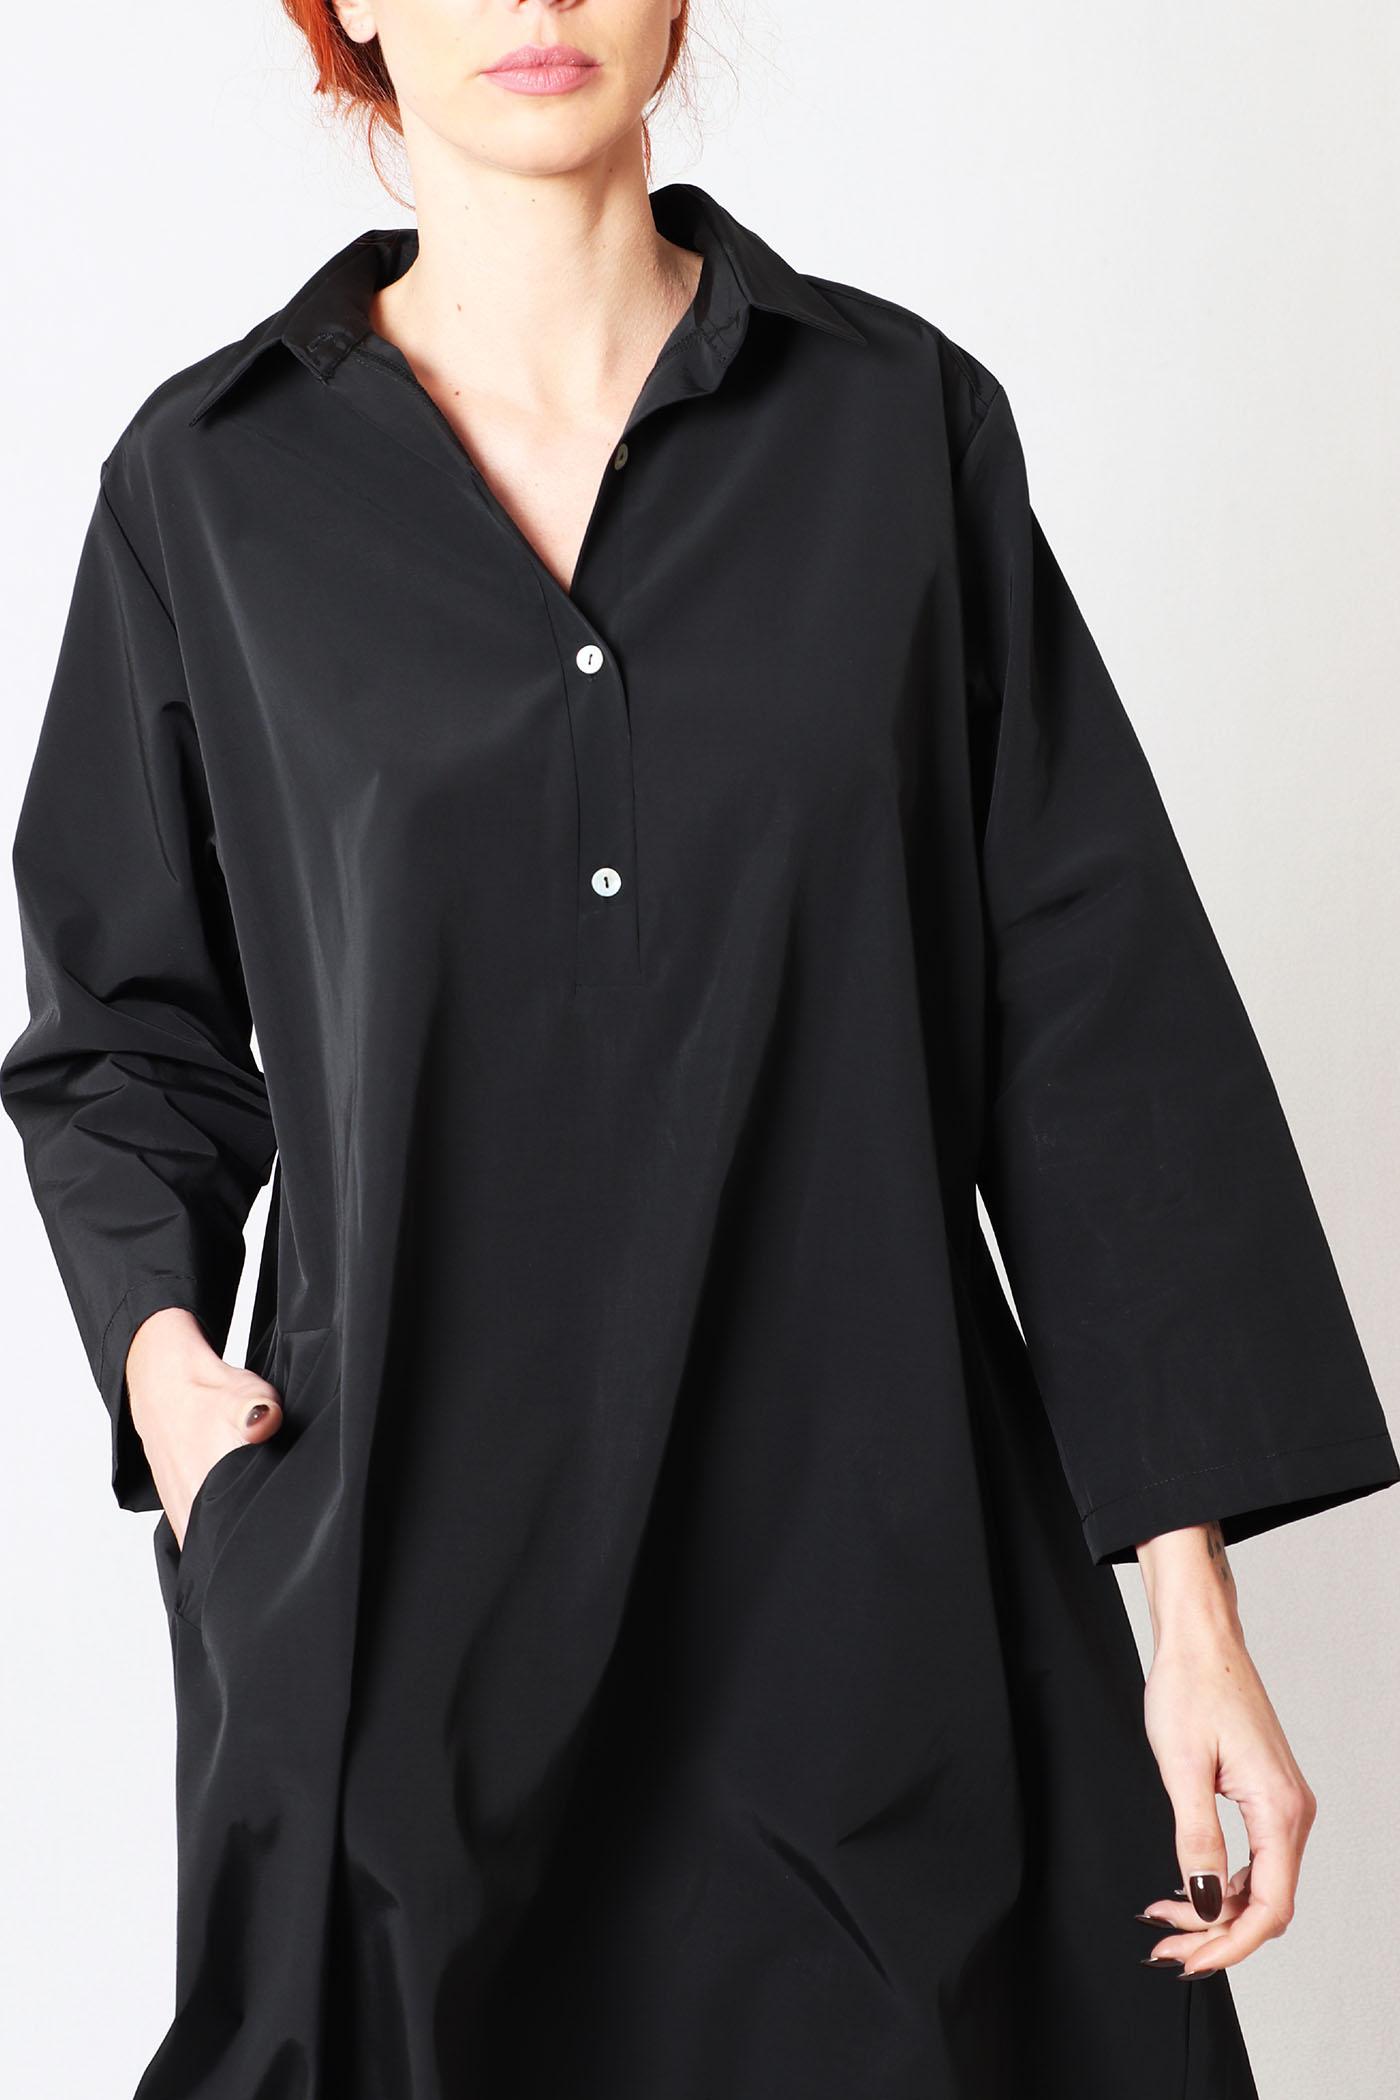 scar-id-obi-dress-vestido-namburu-4